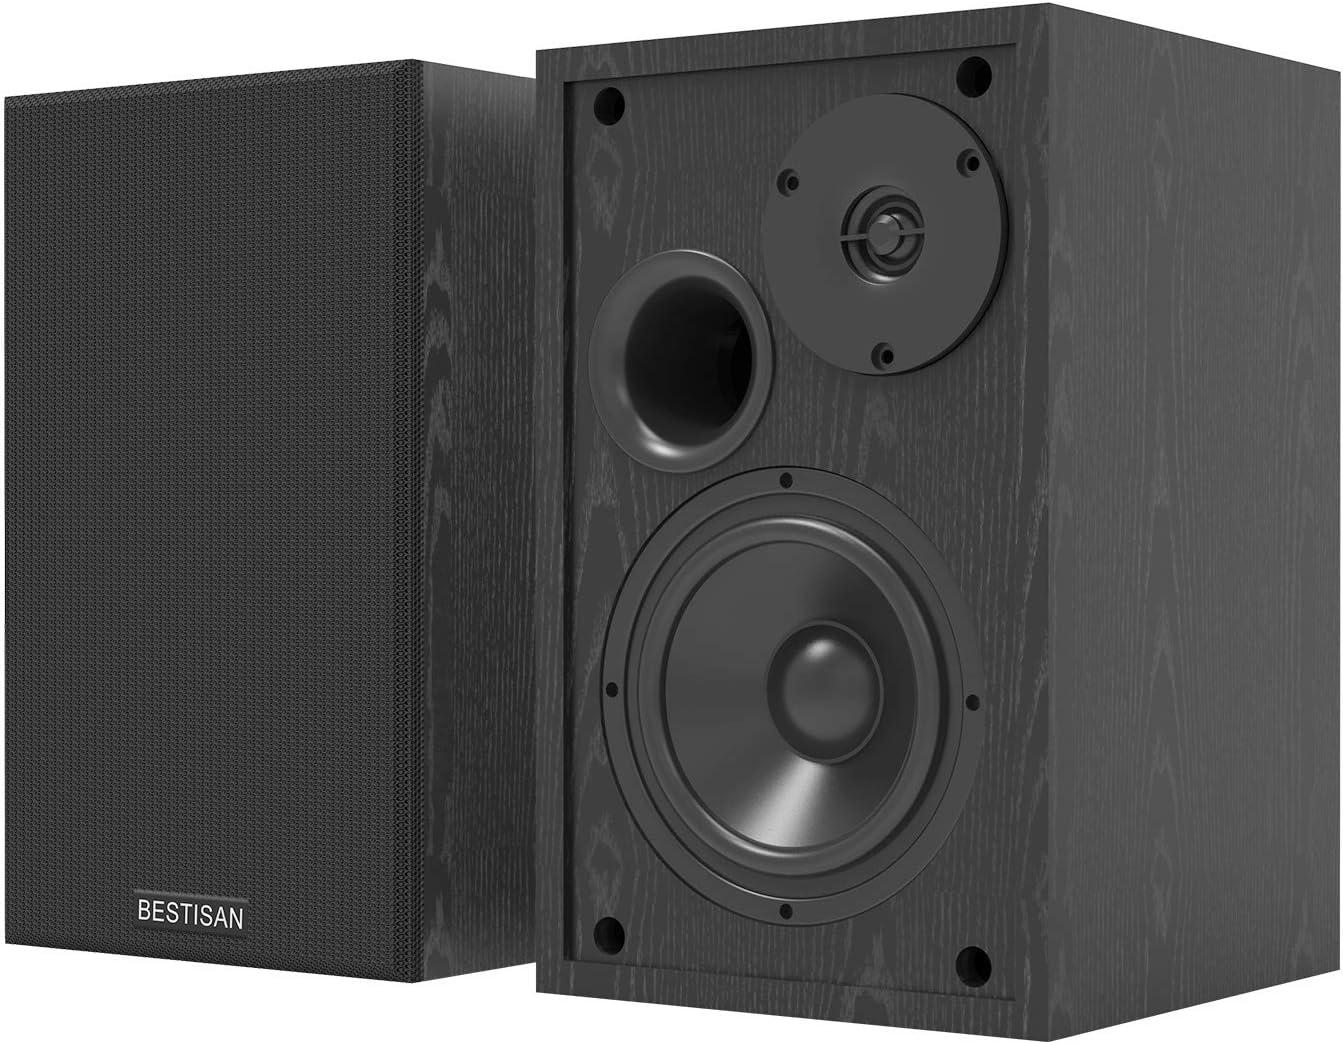 Bookshelf Speakers, BESTISAN Powered Bluetooth 5.0 Home Audio Bookshelf Speakers, 4 inch Near Field Speaker with Deep Bass Response, Studio Monitor with 2 Auxiliary Line Input 50W - Black-2021 Model